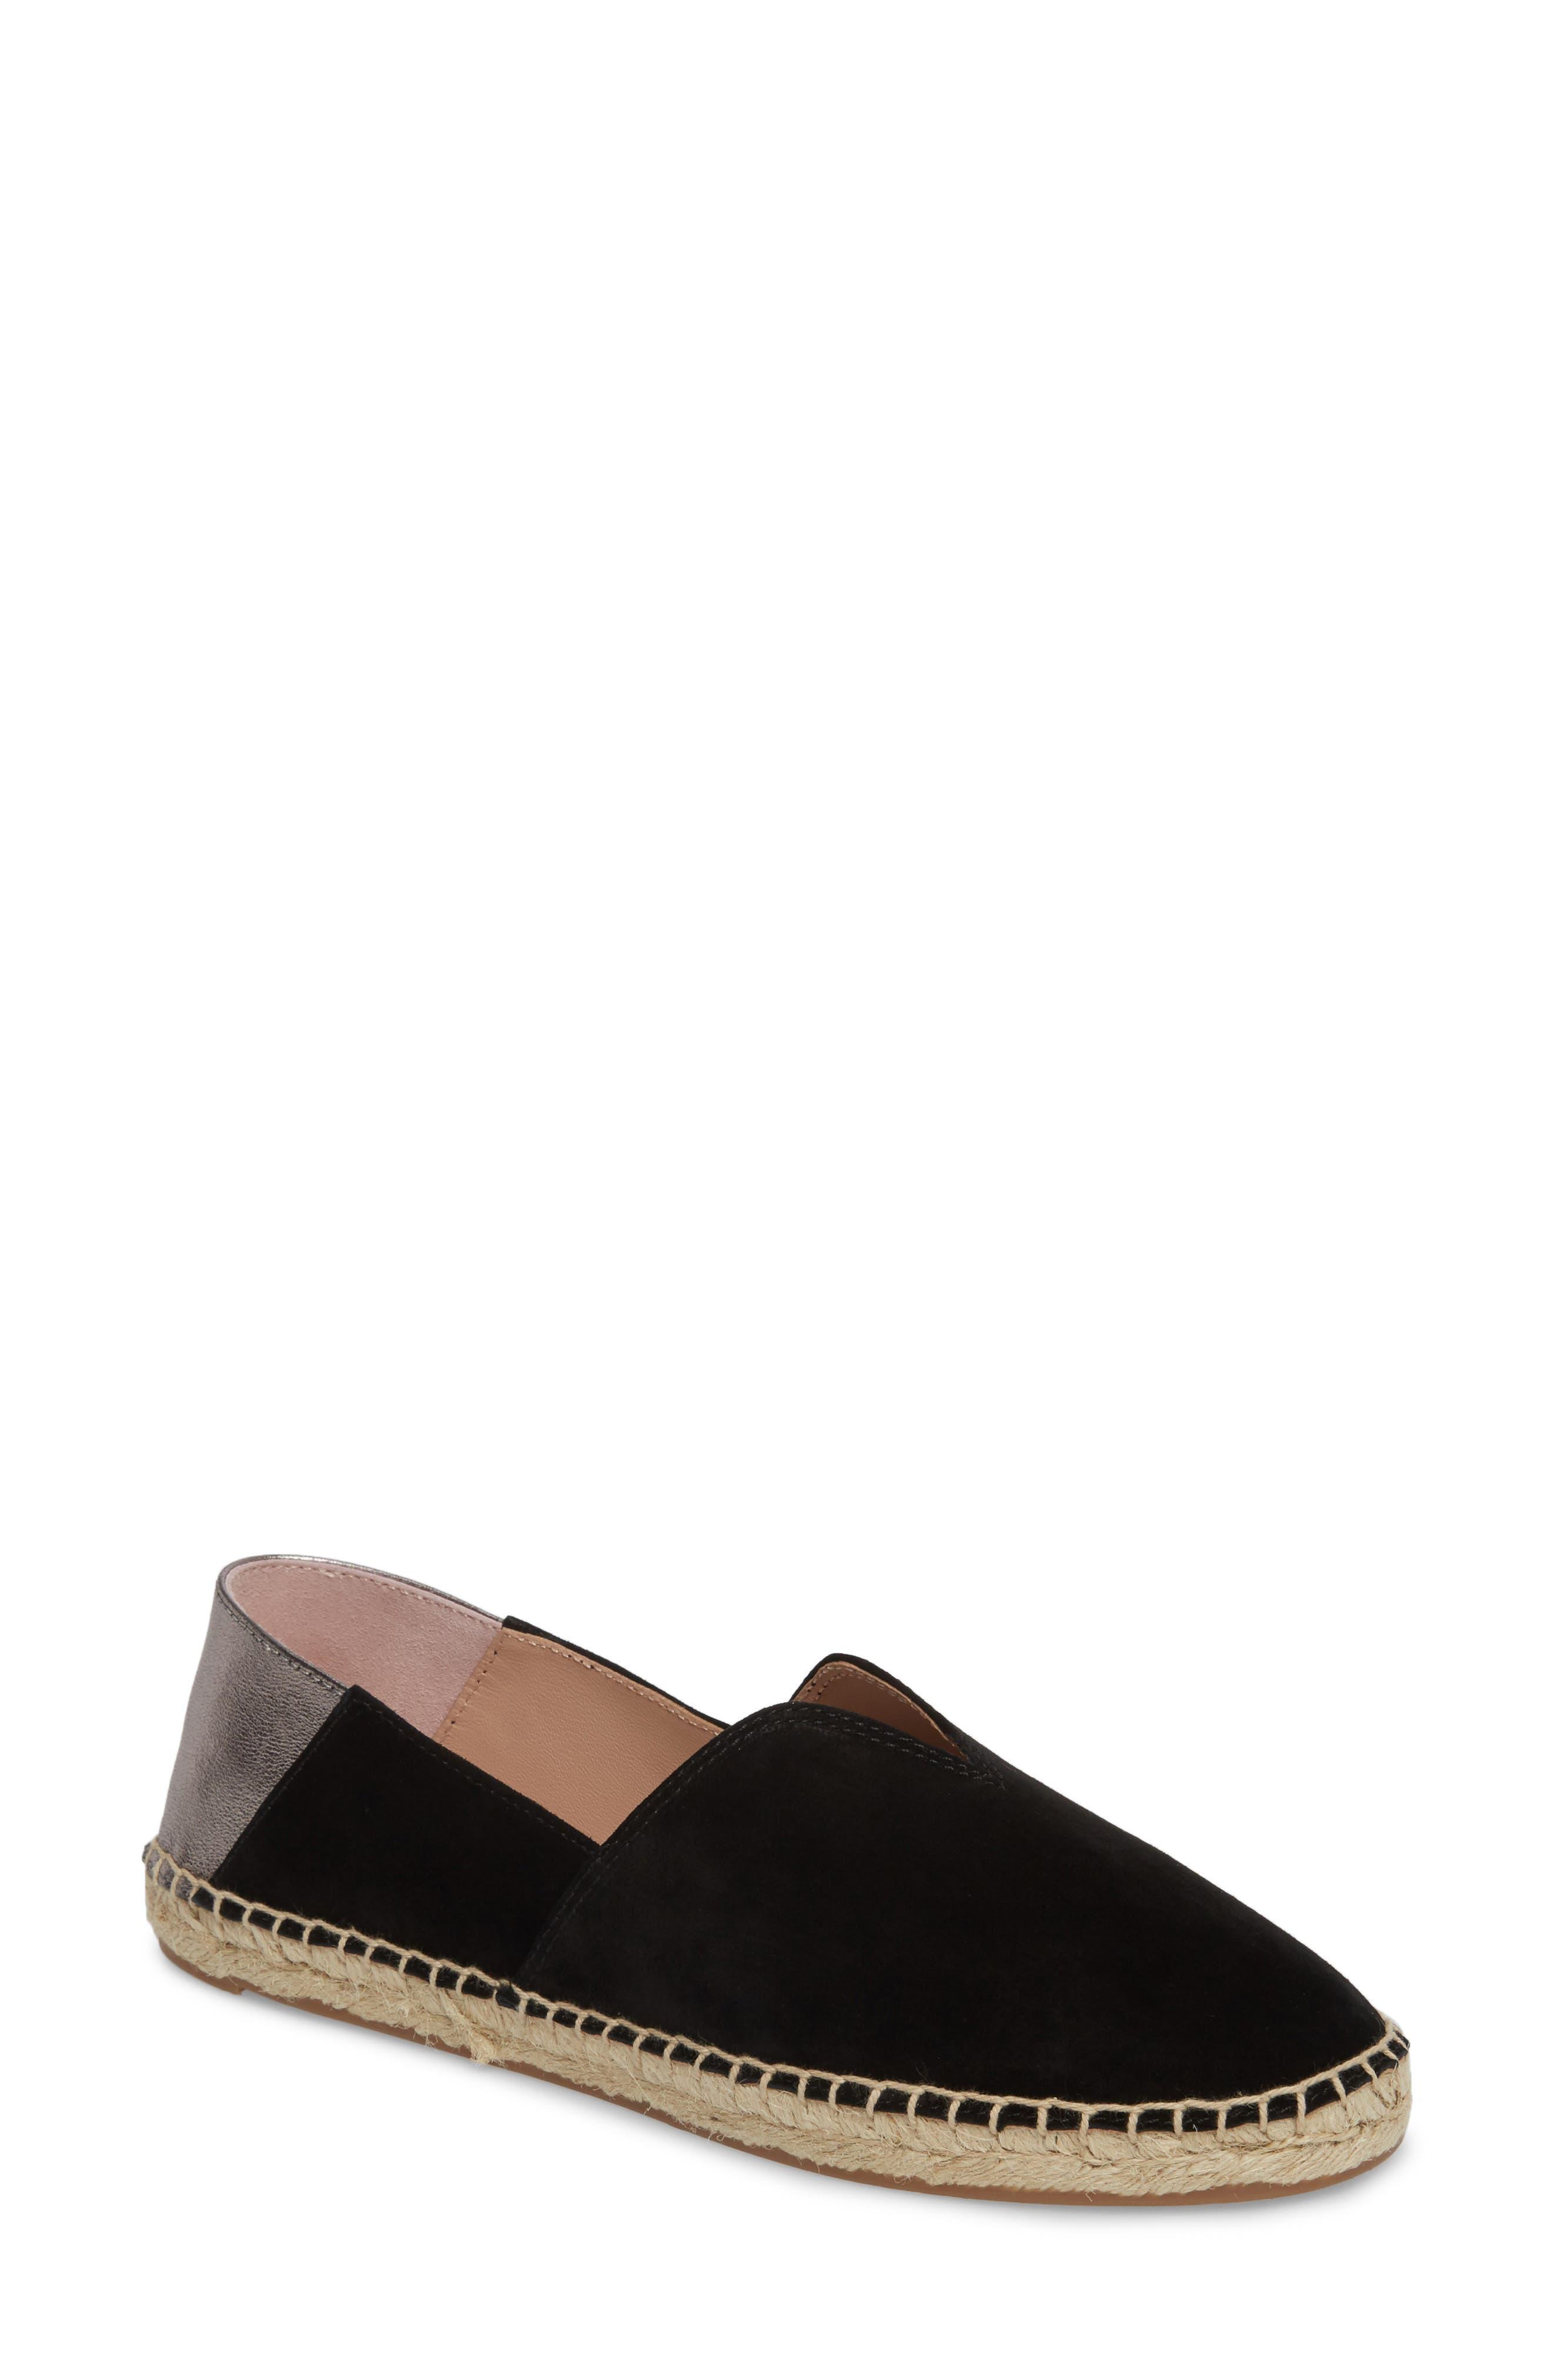 Ilene Slip-On Flat,                         Main,                         color, BLACK SUEDE